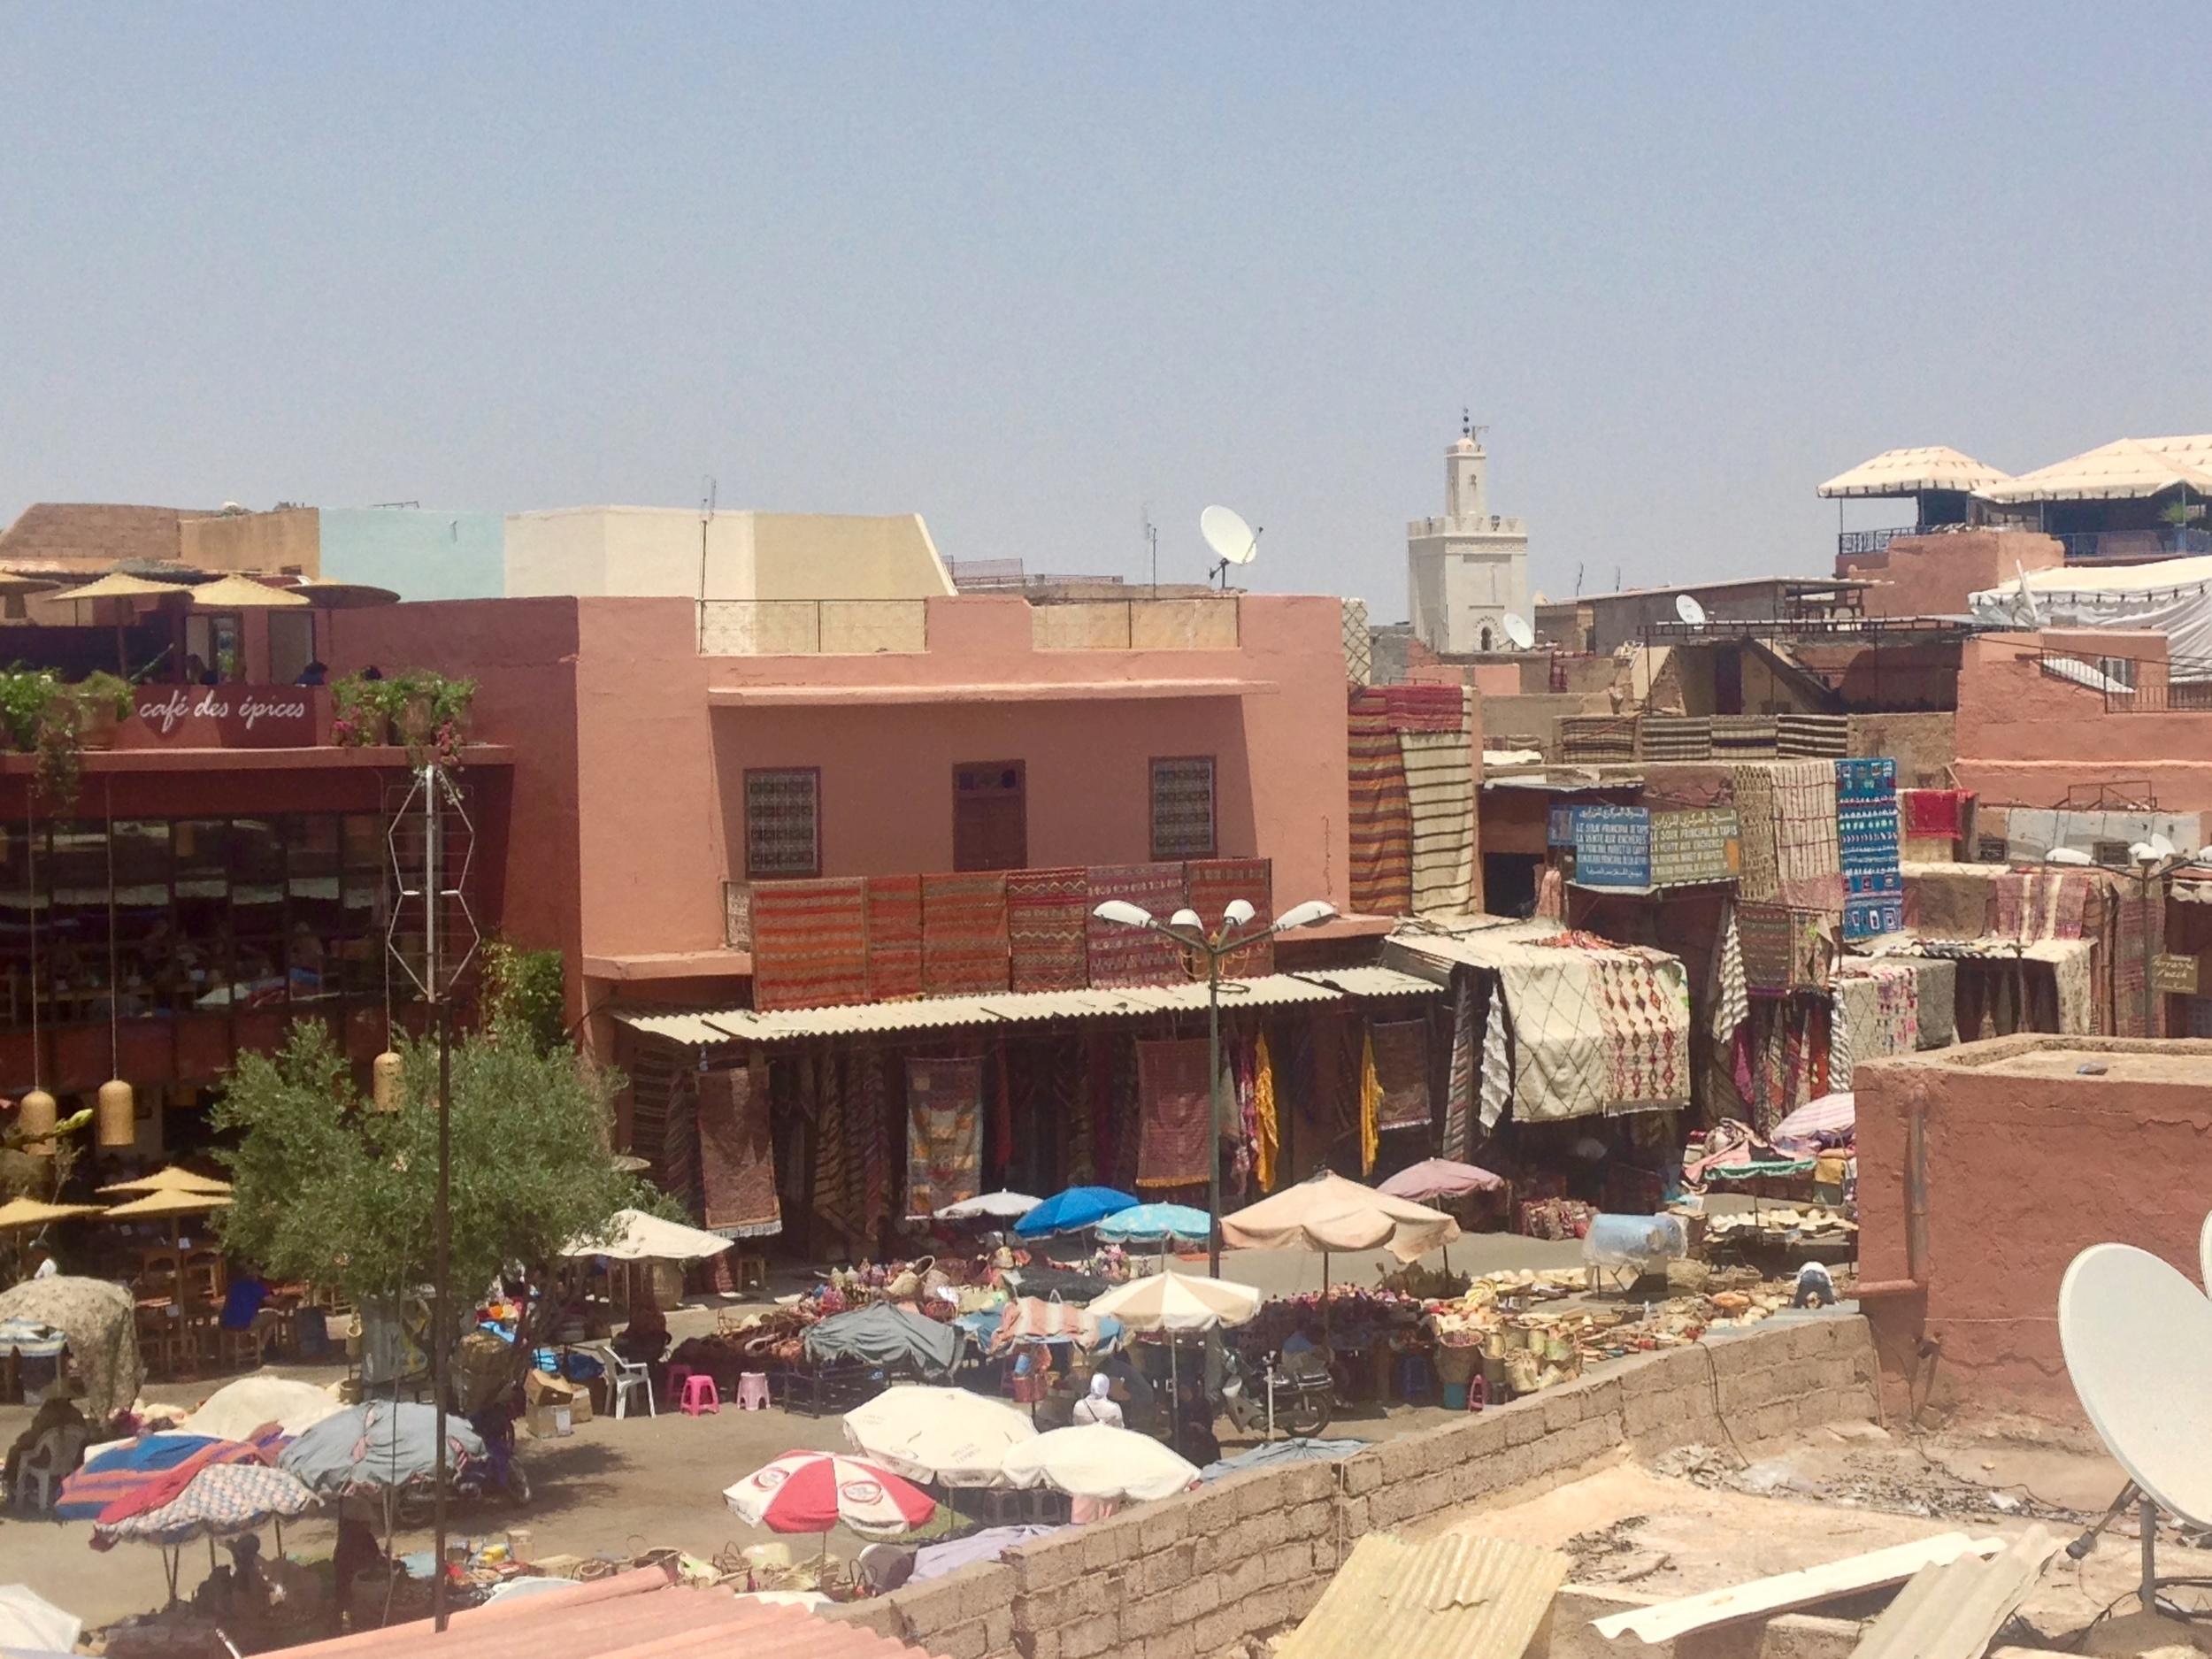 Jemaa el-Fna Marketplace